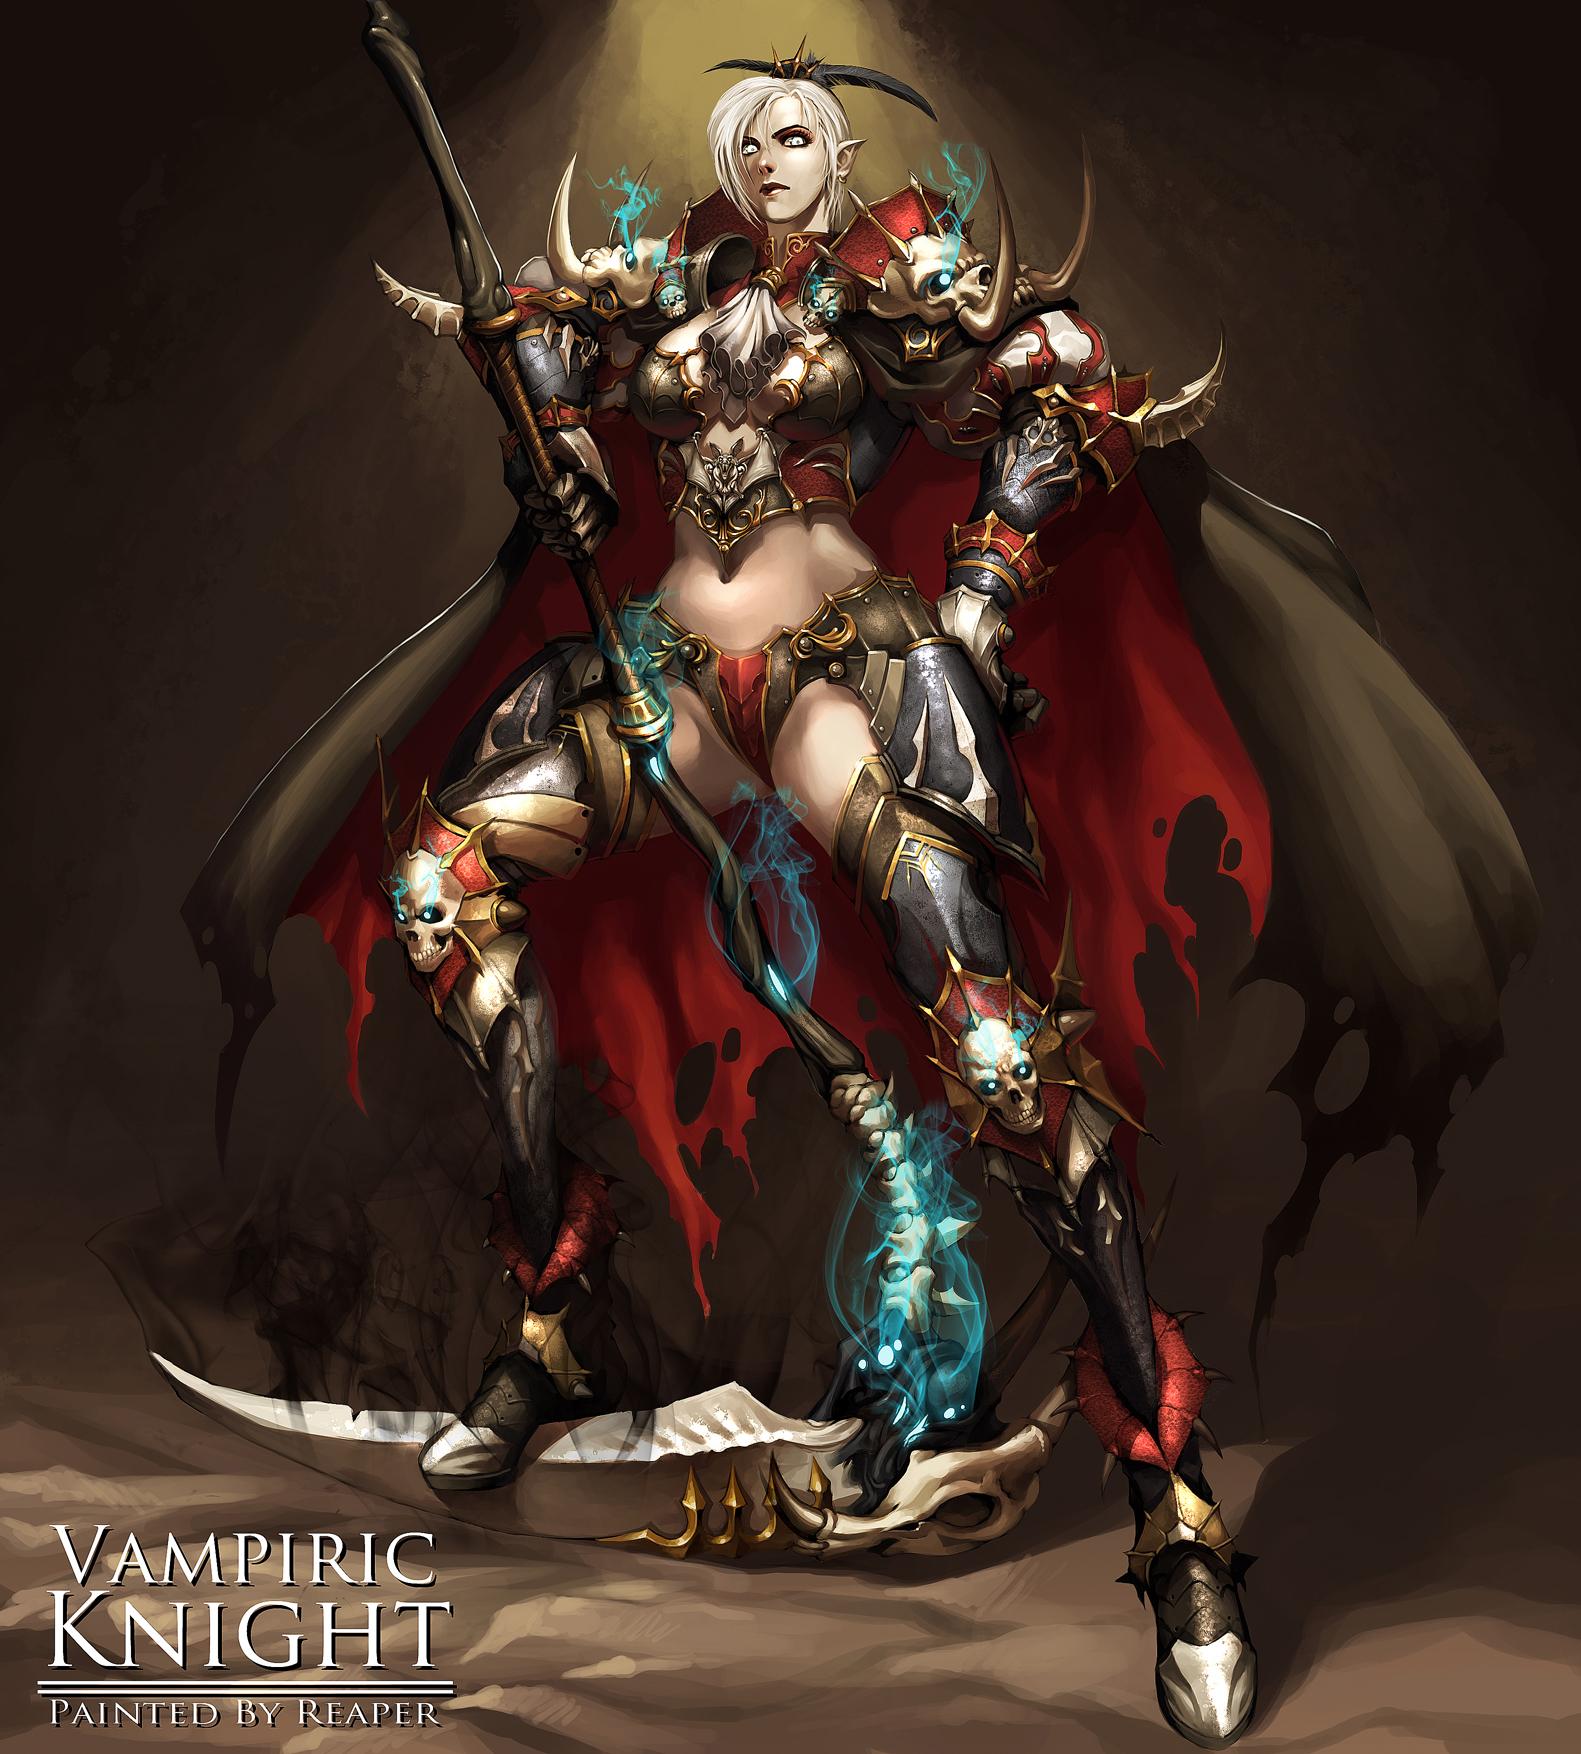 Female Vampiric Knight by reaper78